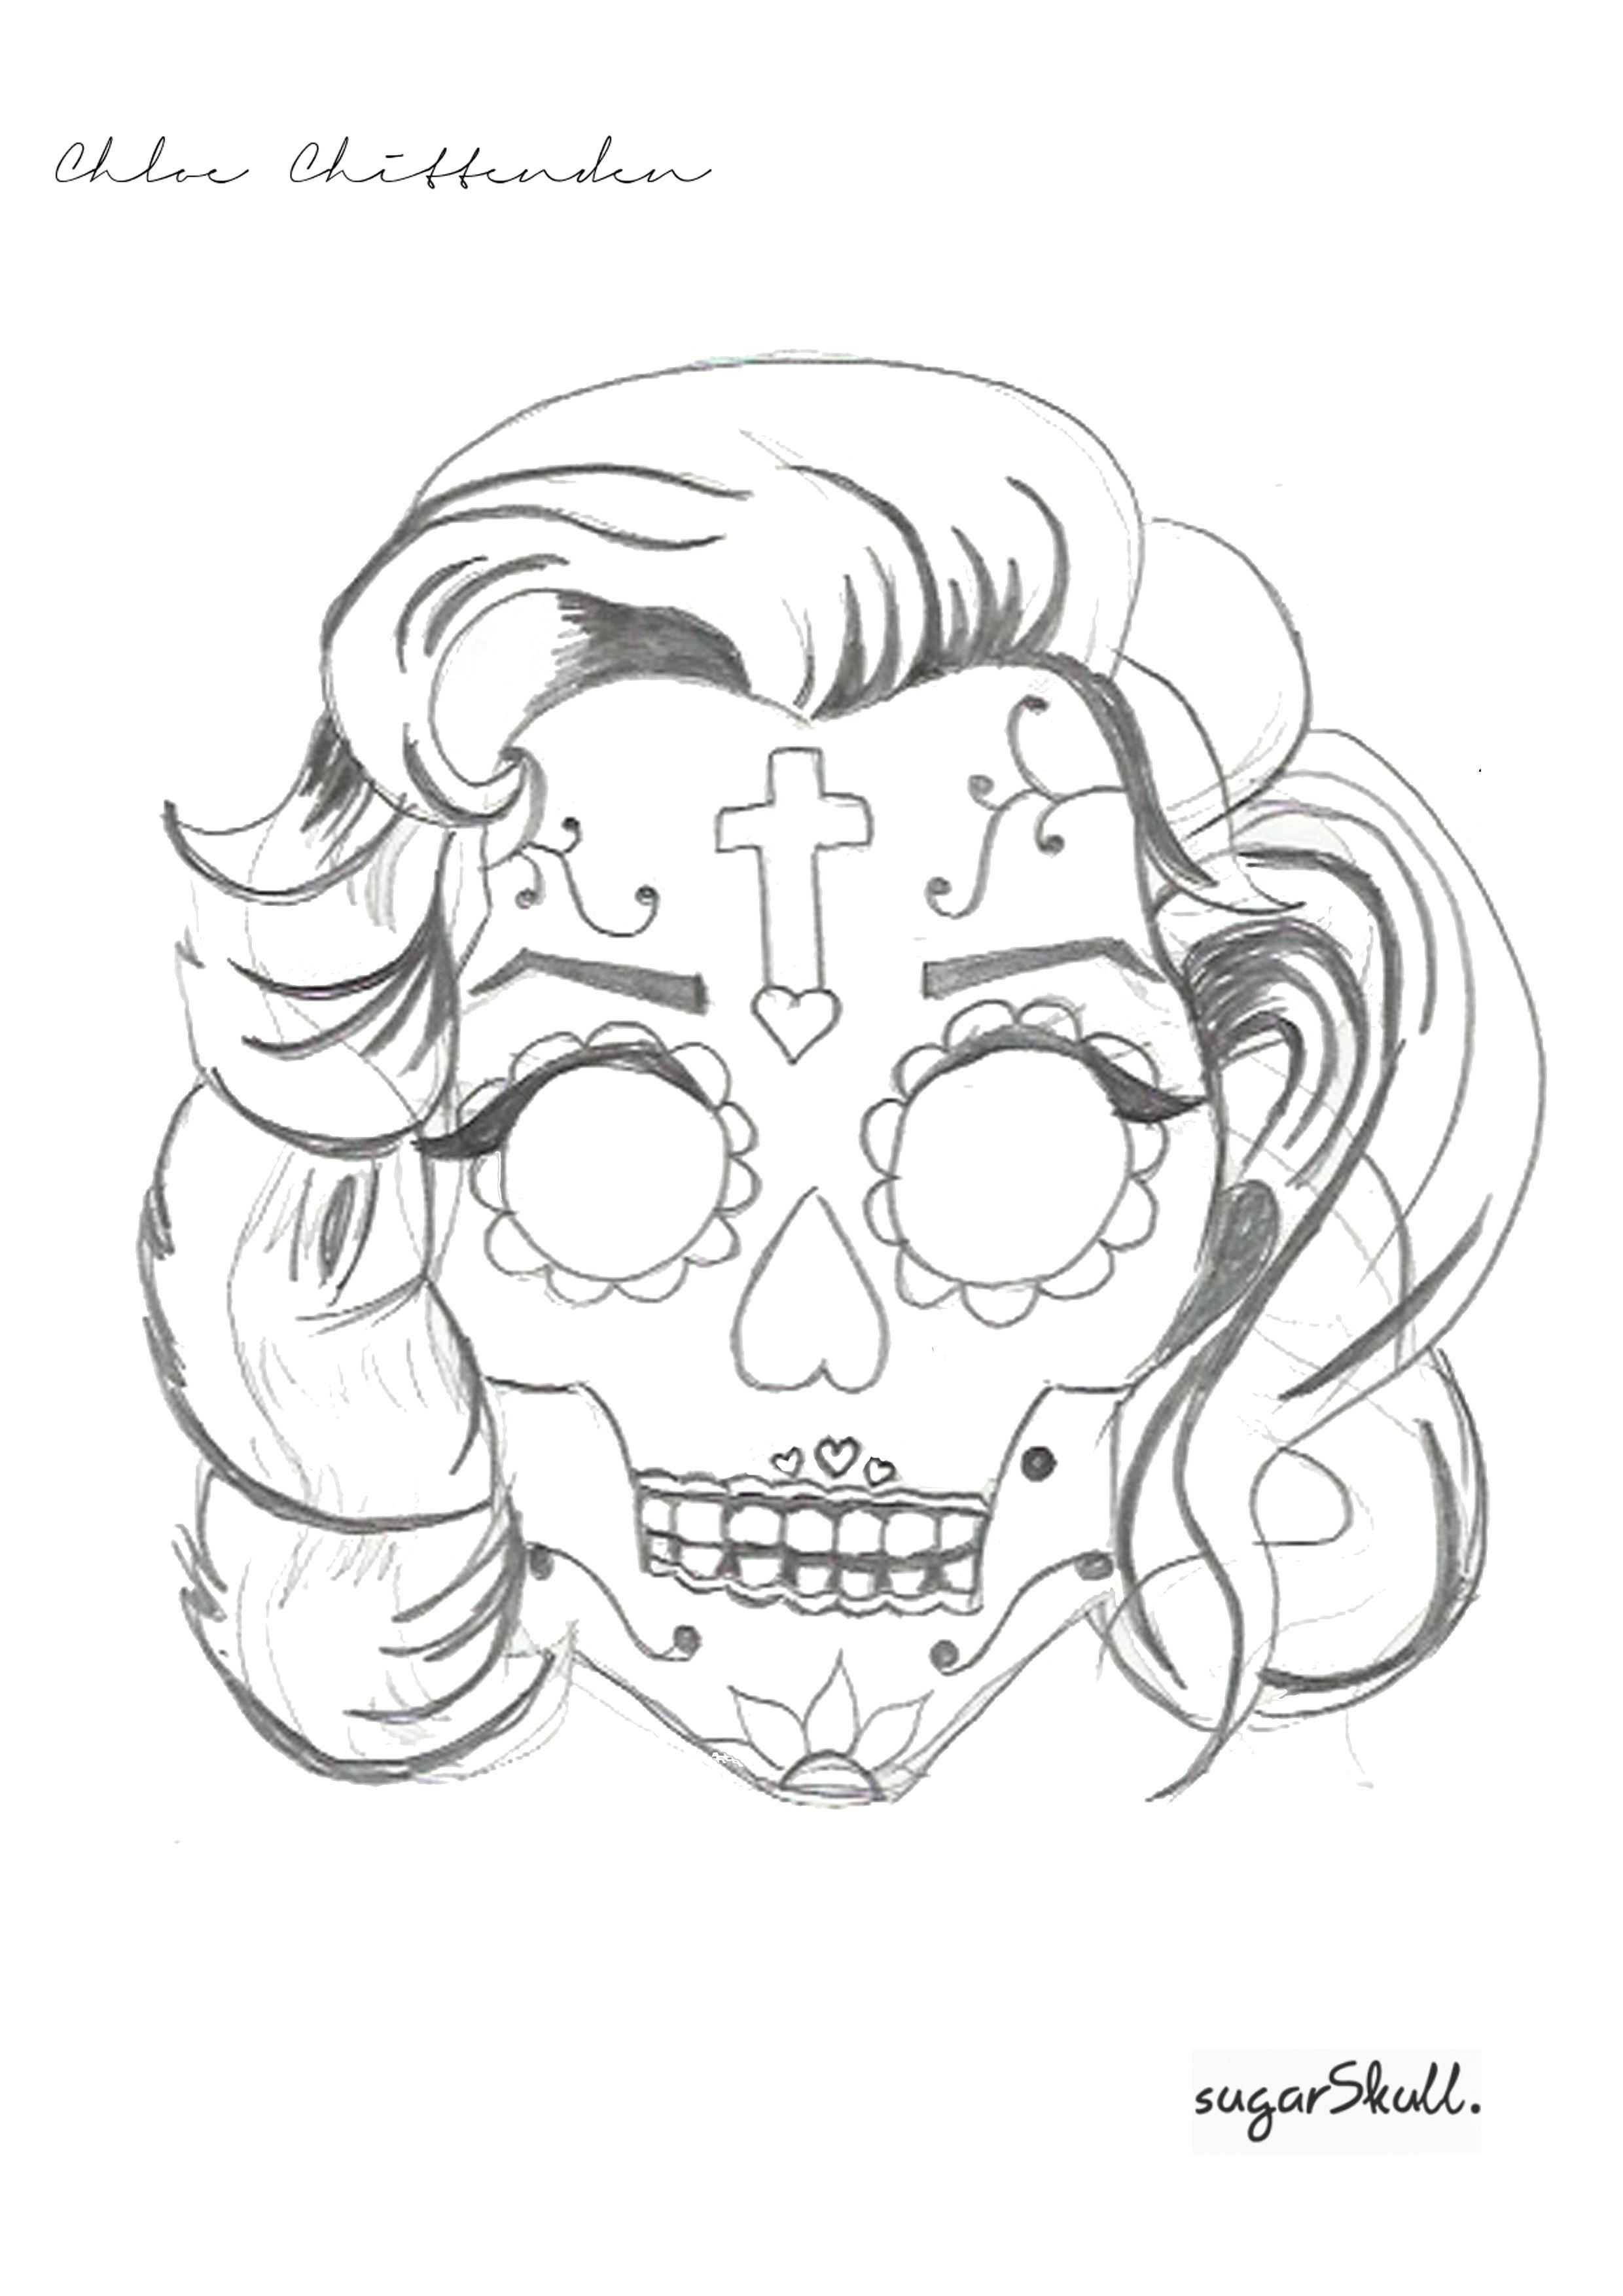 Sugar Skull T Shirt Design By Chloe Chittenden At Coroflot